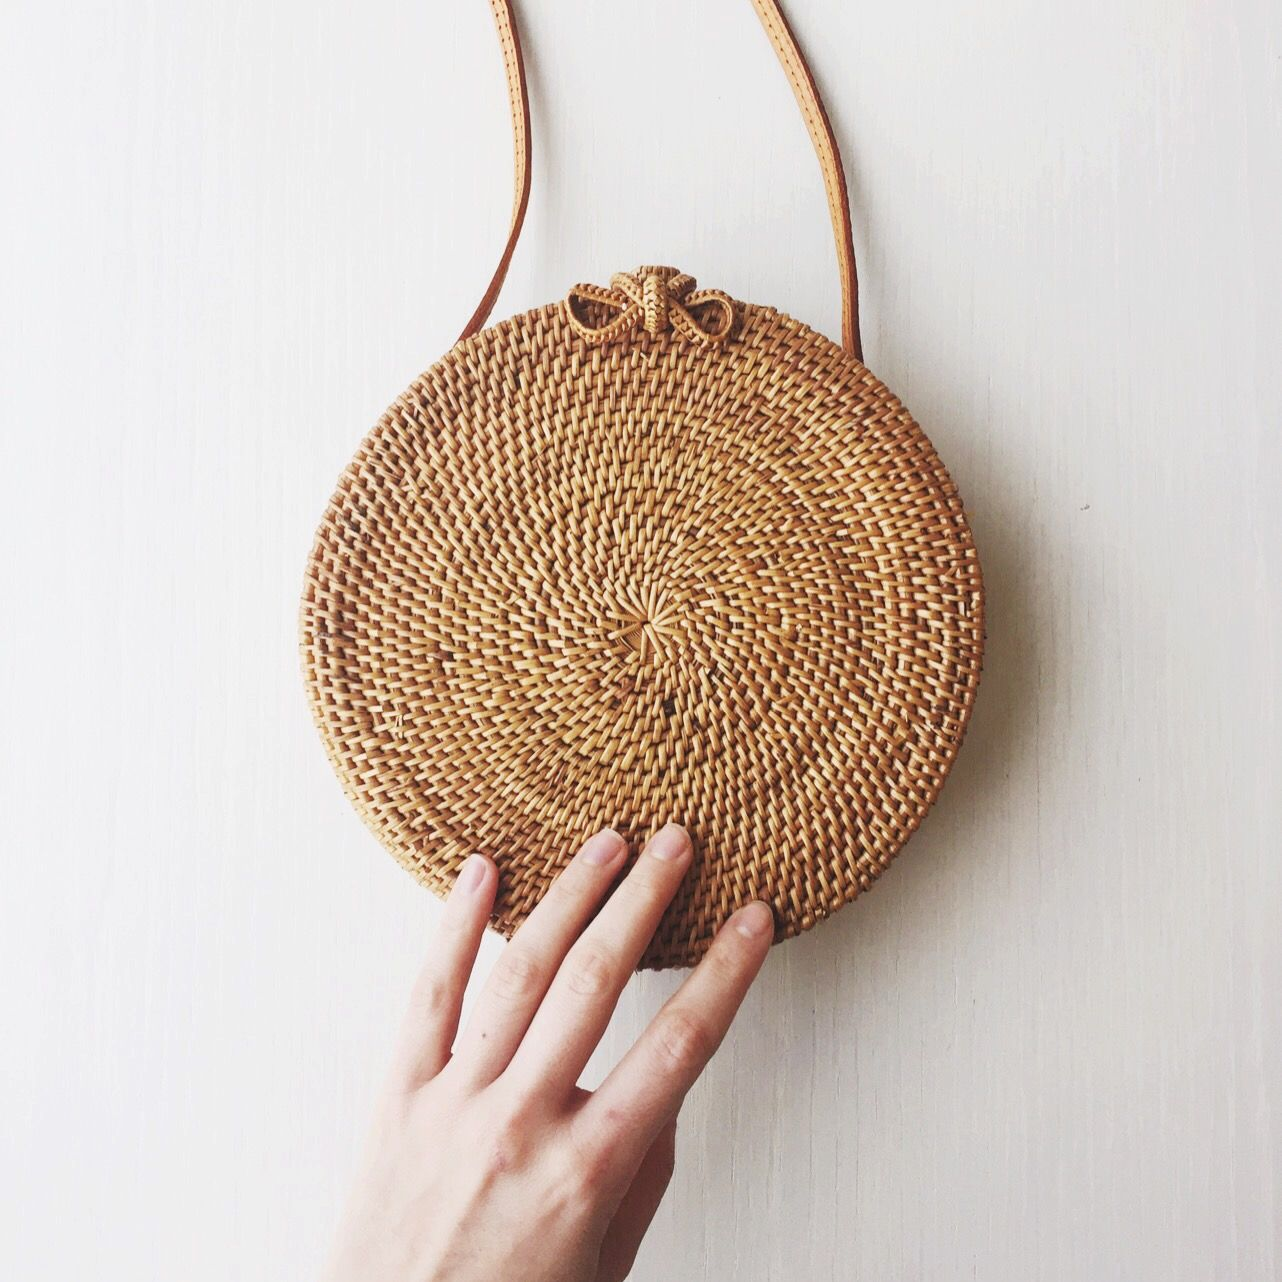 bembien woven circle bag